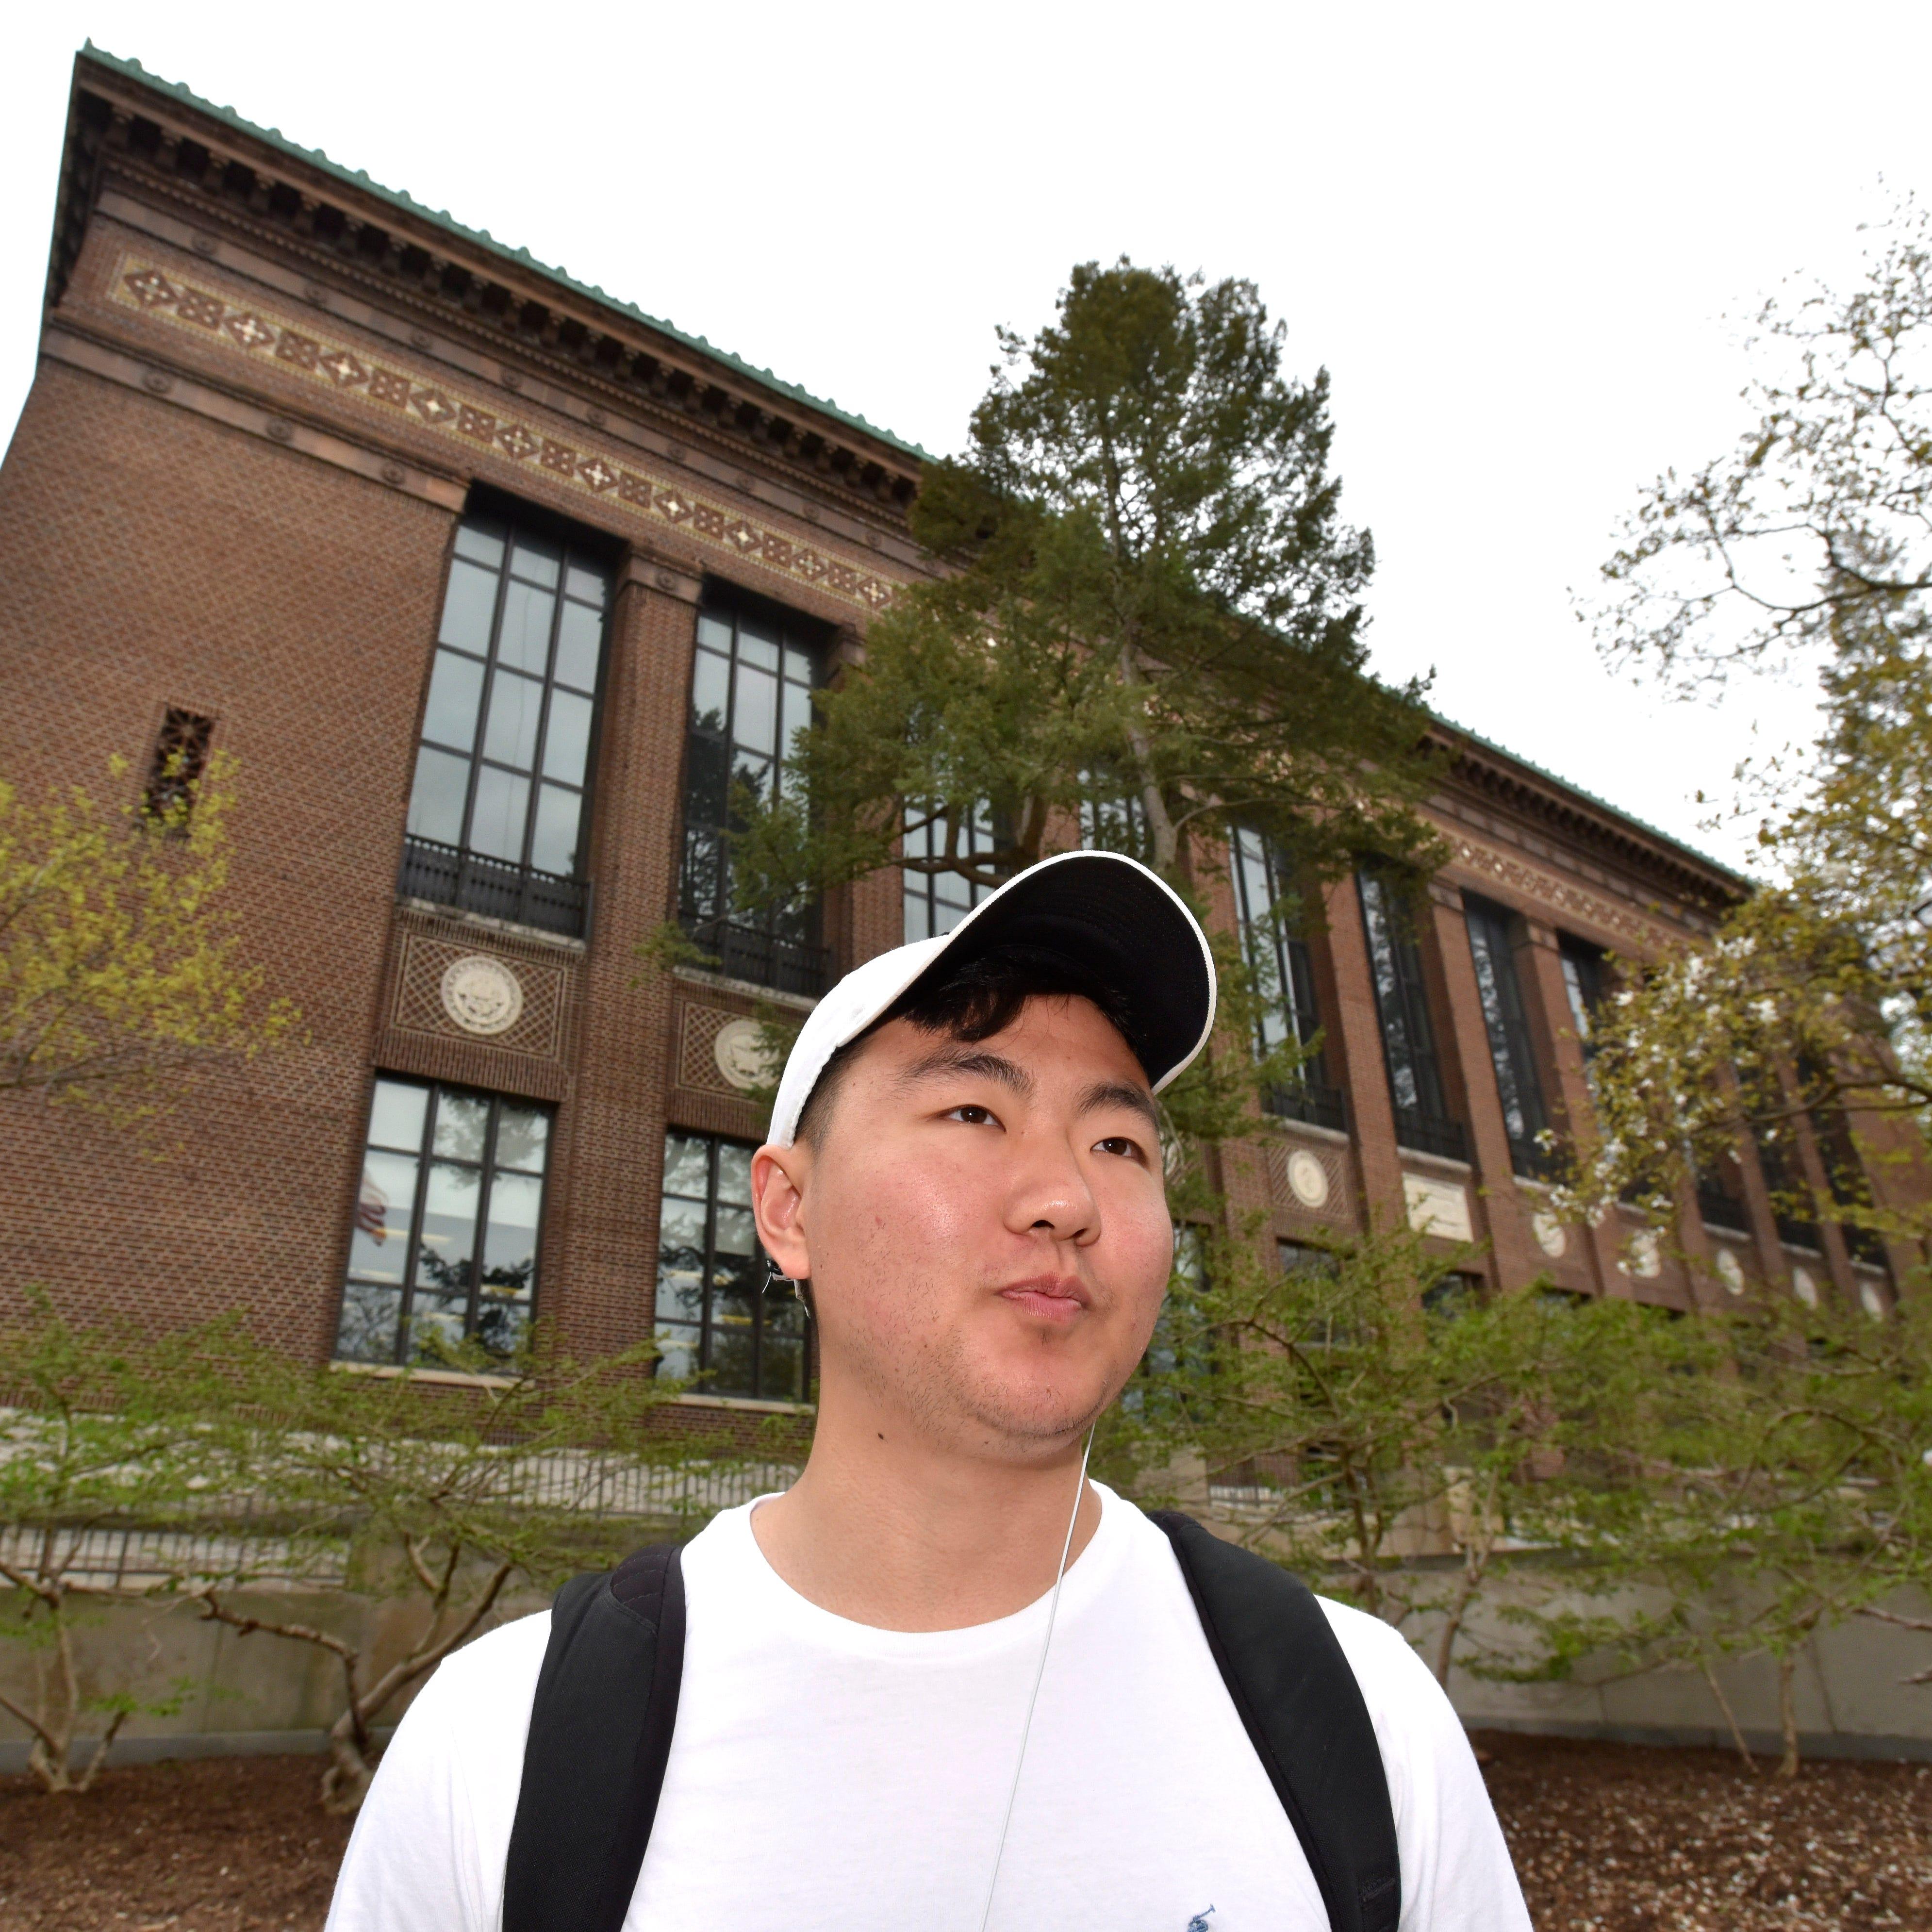 Michigan student loan debt increases 52% since 2007